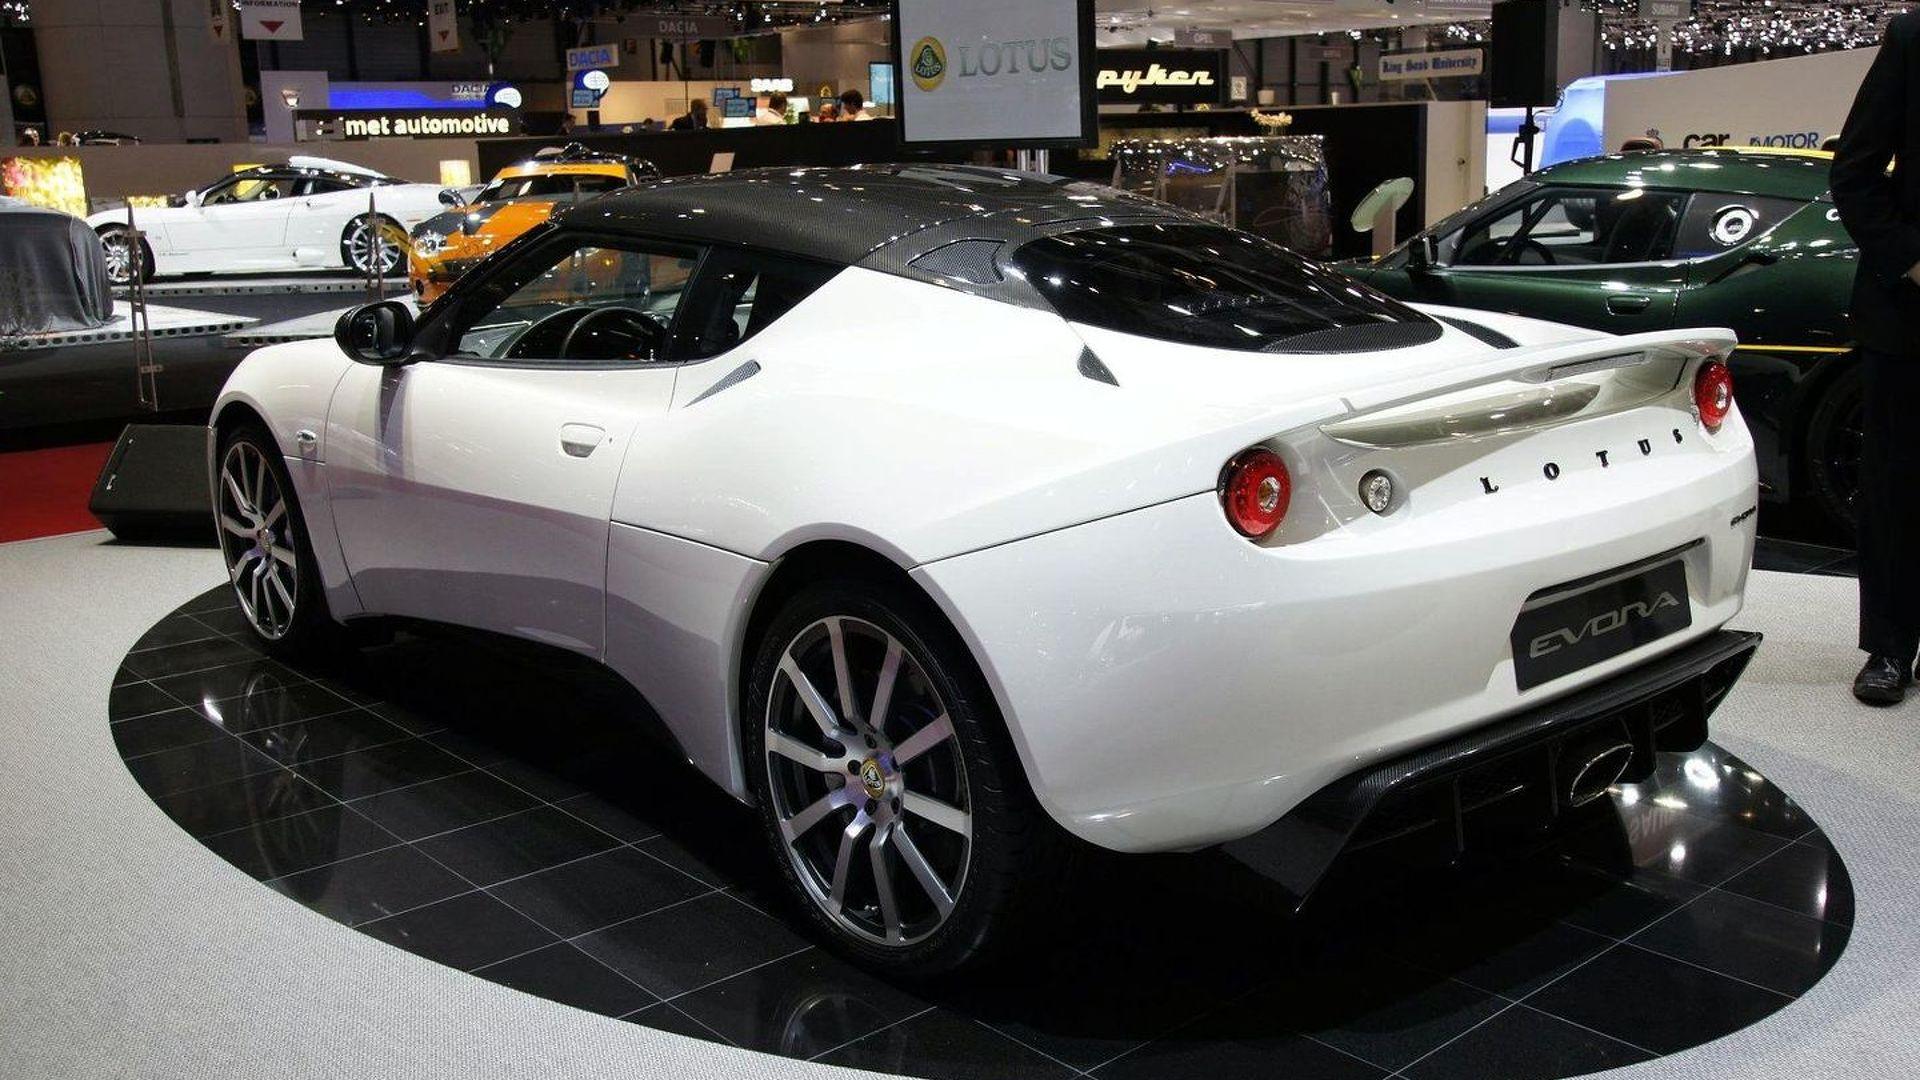 https://icdn-2.motor1.com/images/mgl/AKzRP/s1/2010-195673-lotus-evora-carbon-concept-live-in-geneva-02-03-20101.jpg